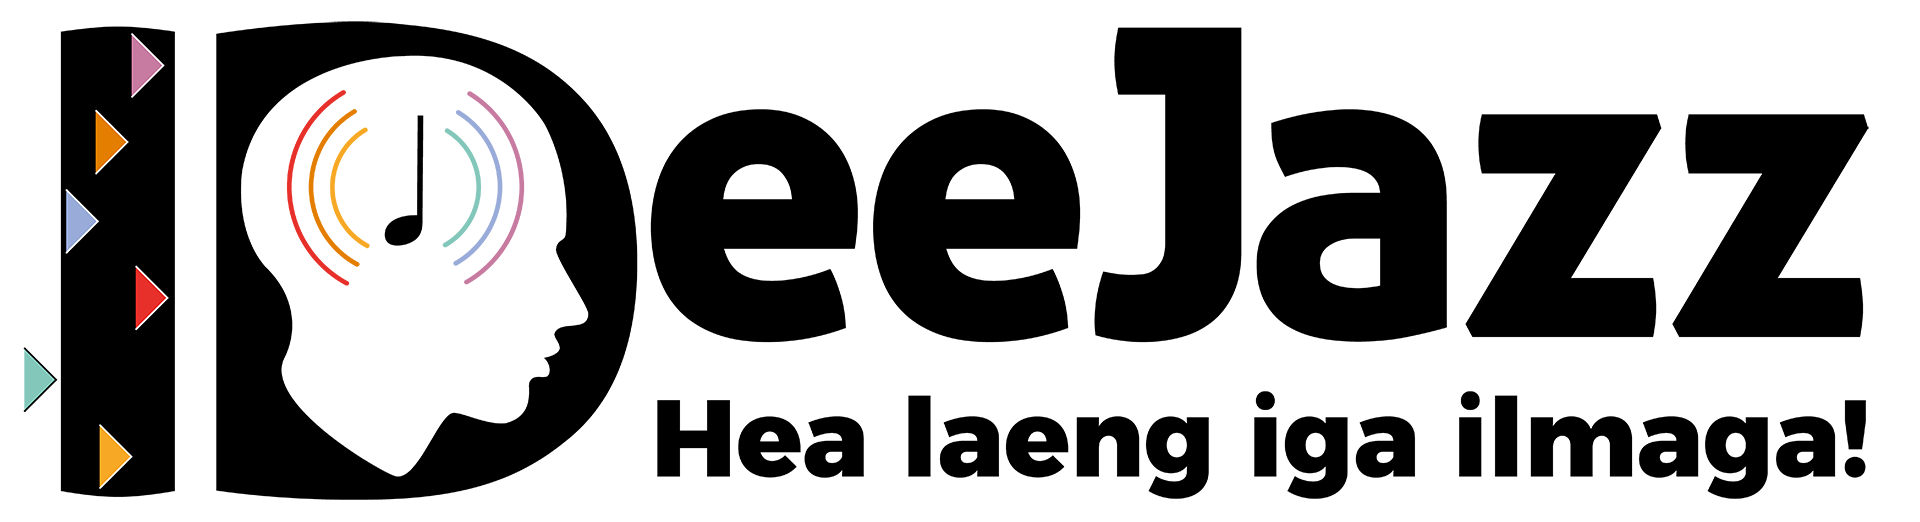 IDeeJazz 2018